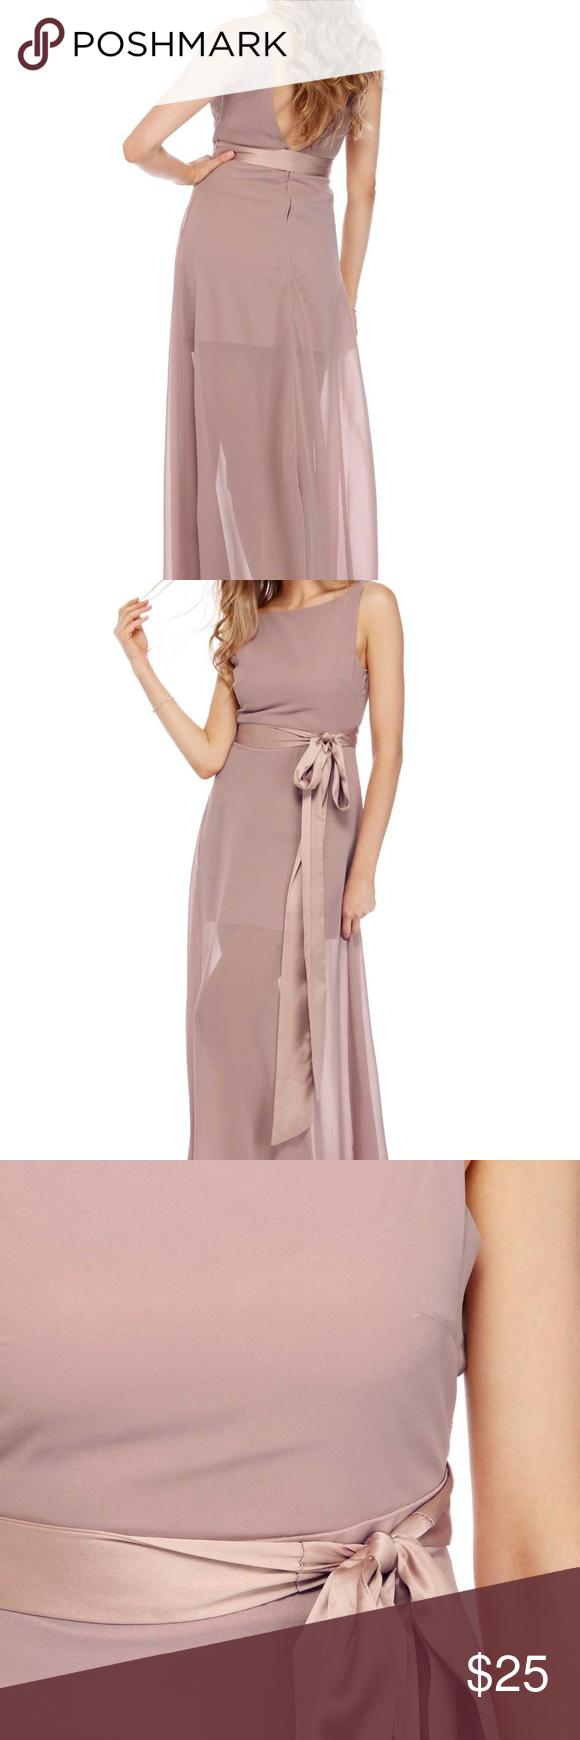 Windsor Mauve Blush Pink Maxi Dress Windsor Mauve Chiffon Maxi Dress With Satin Belt Worn Once In June 2017 Size Smal Blush Pink Maxi Dress Maxi Dress Dresses [ 1740 x 580 Pixel ]